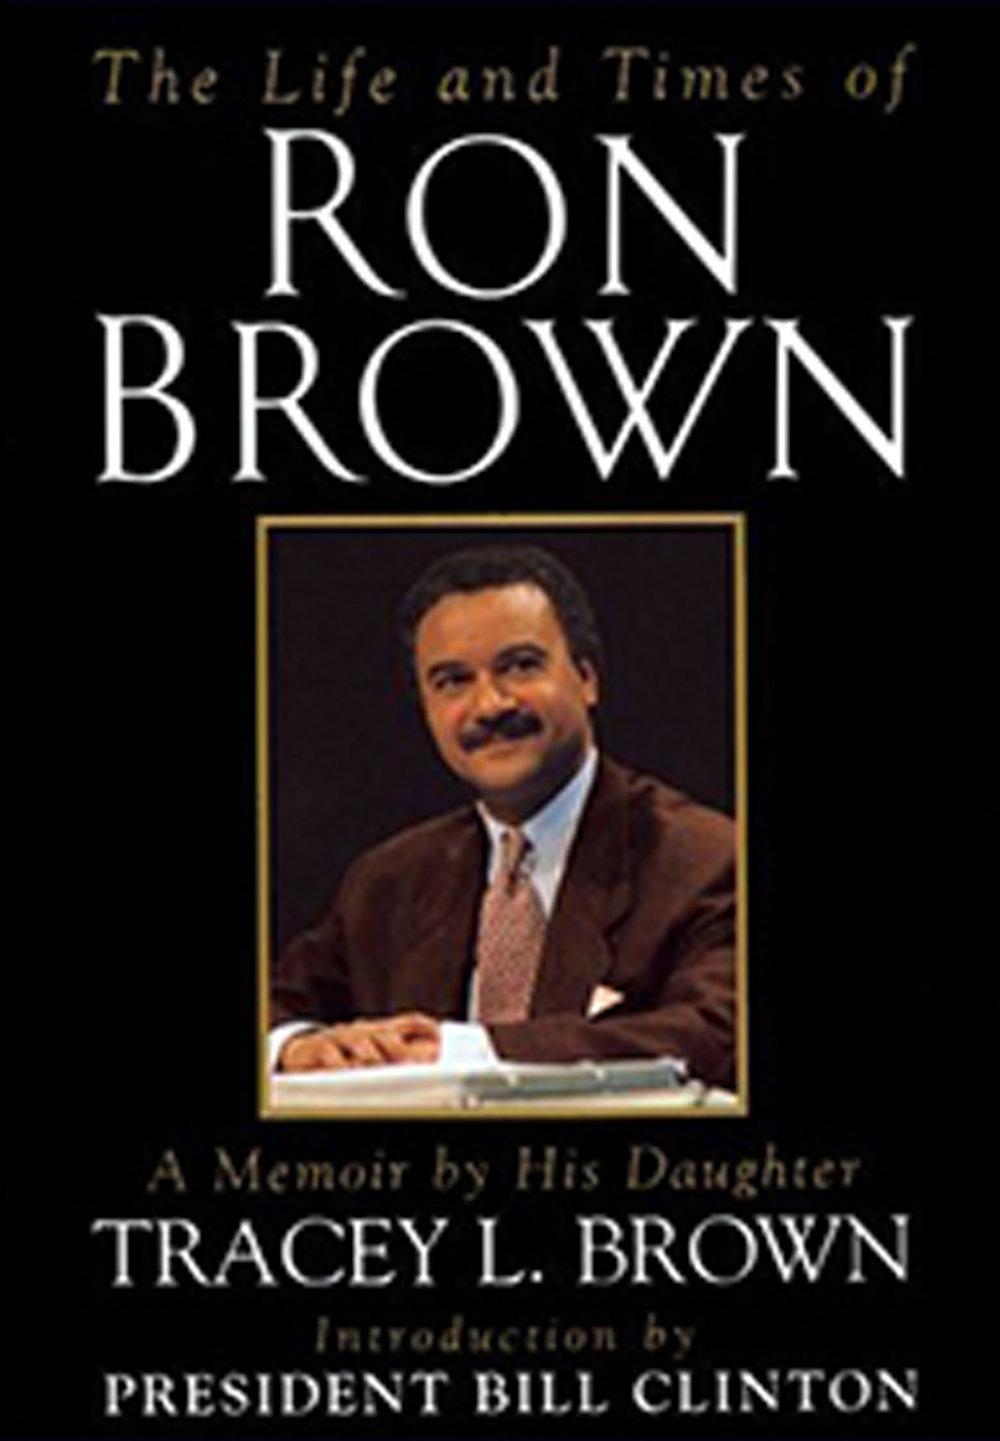 Rob Brown cover.jpg